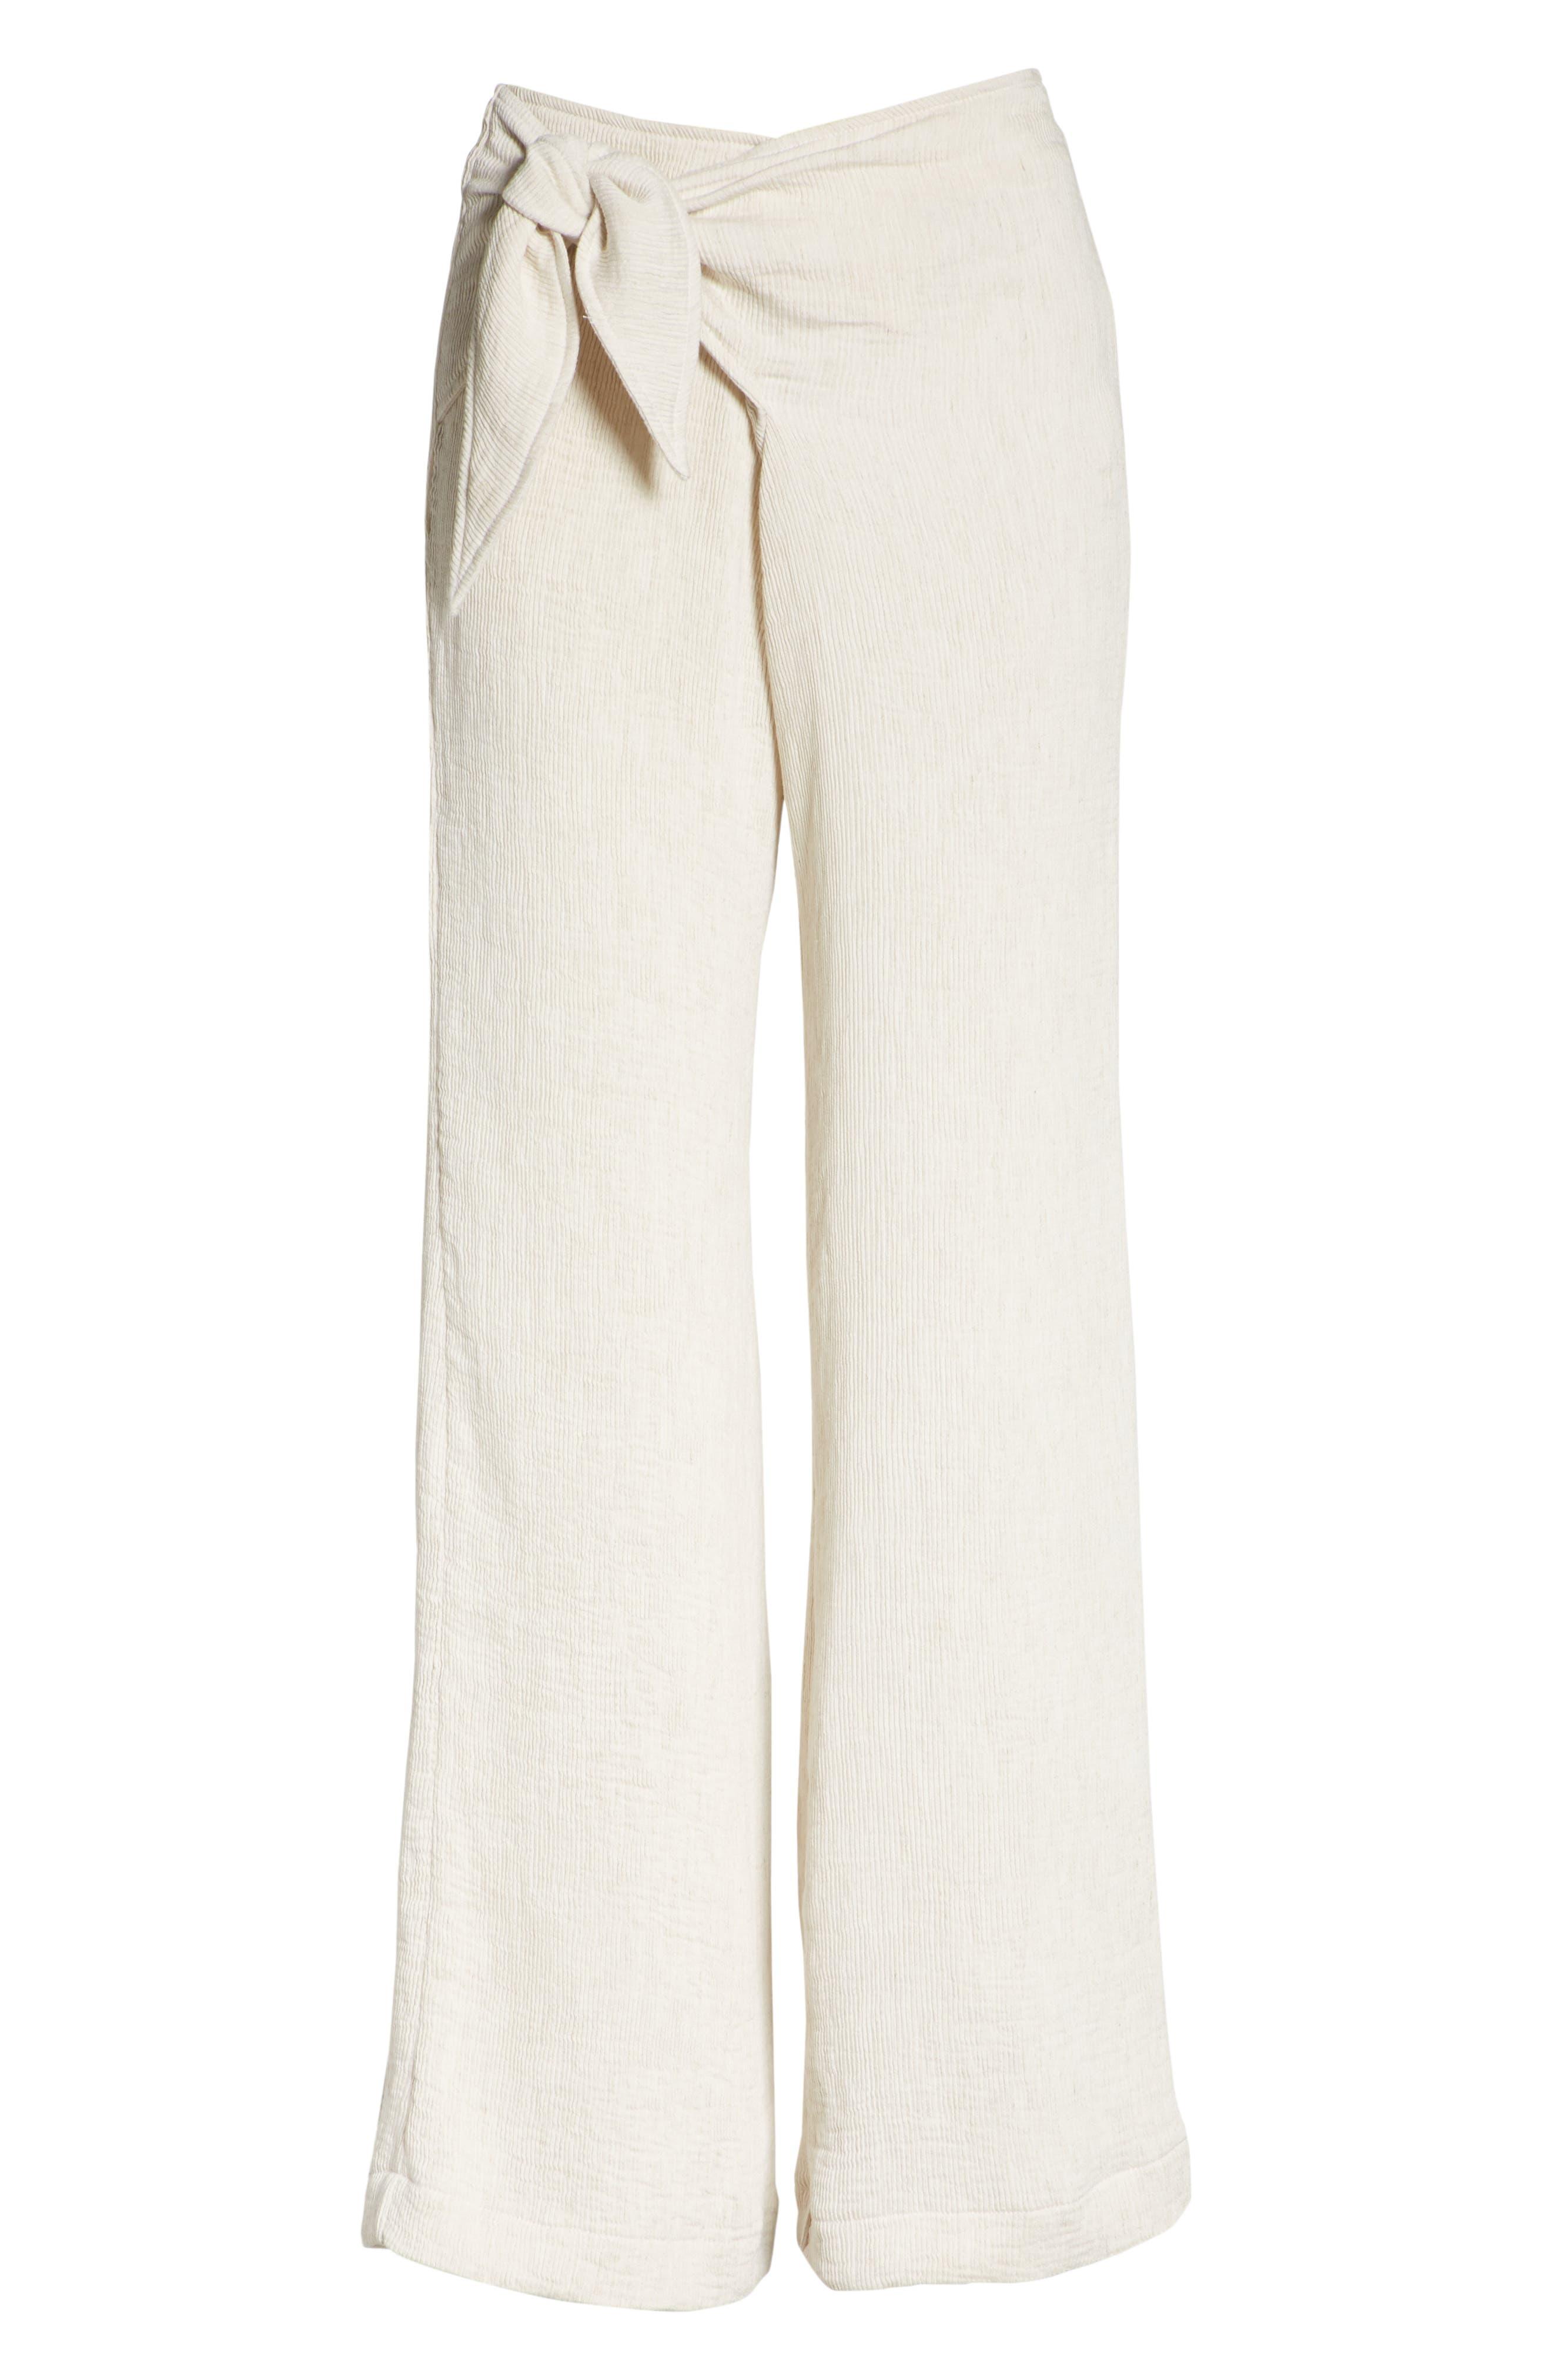 Hatton Drawstring Tie Front Pants,                             Alternate thumbnail 6, color,                             900